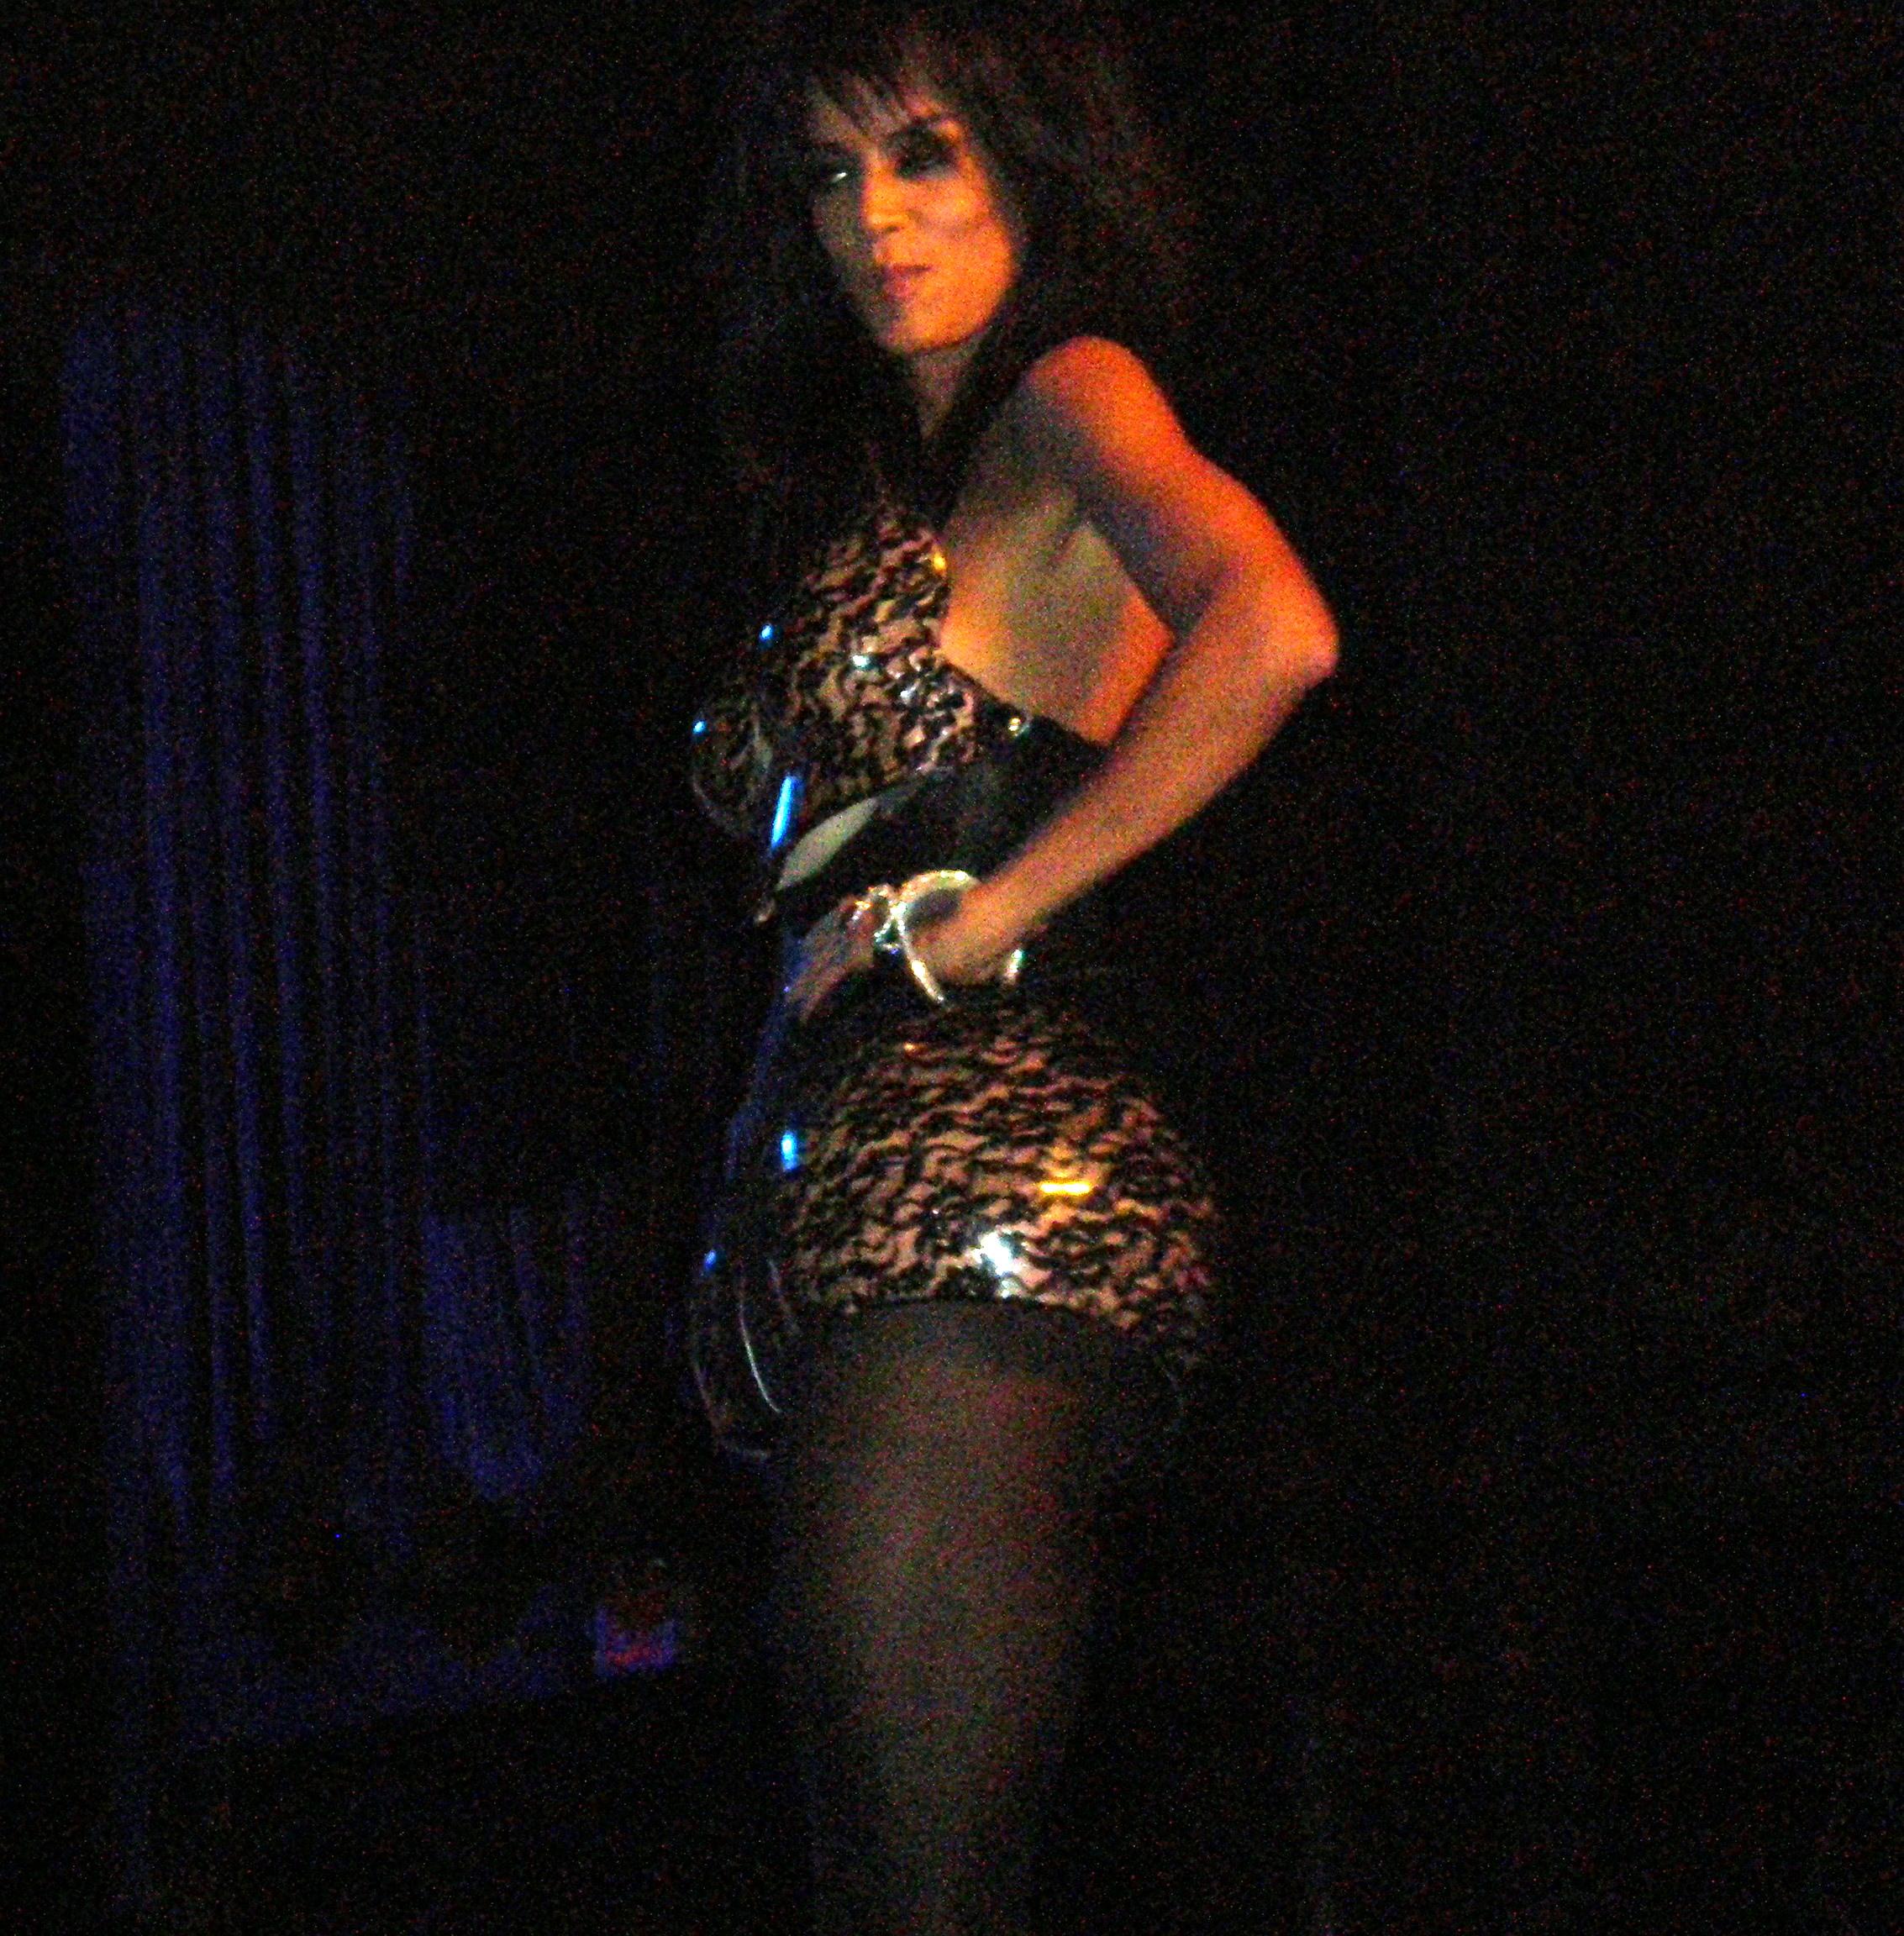 veronica black lingerie